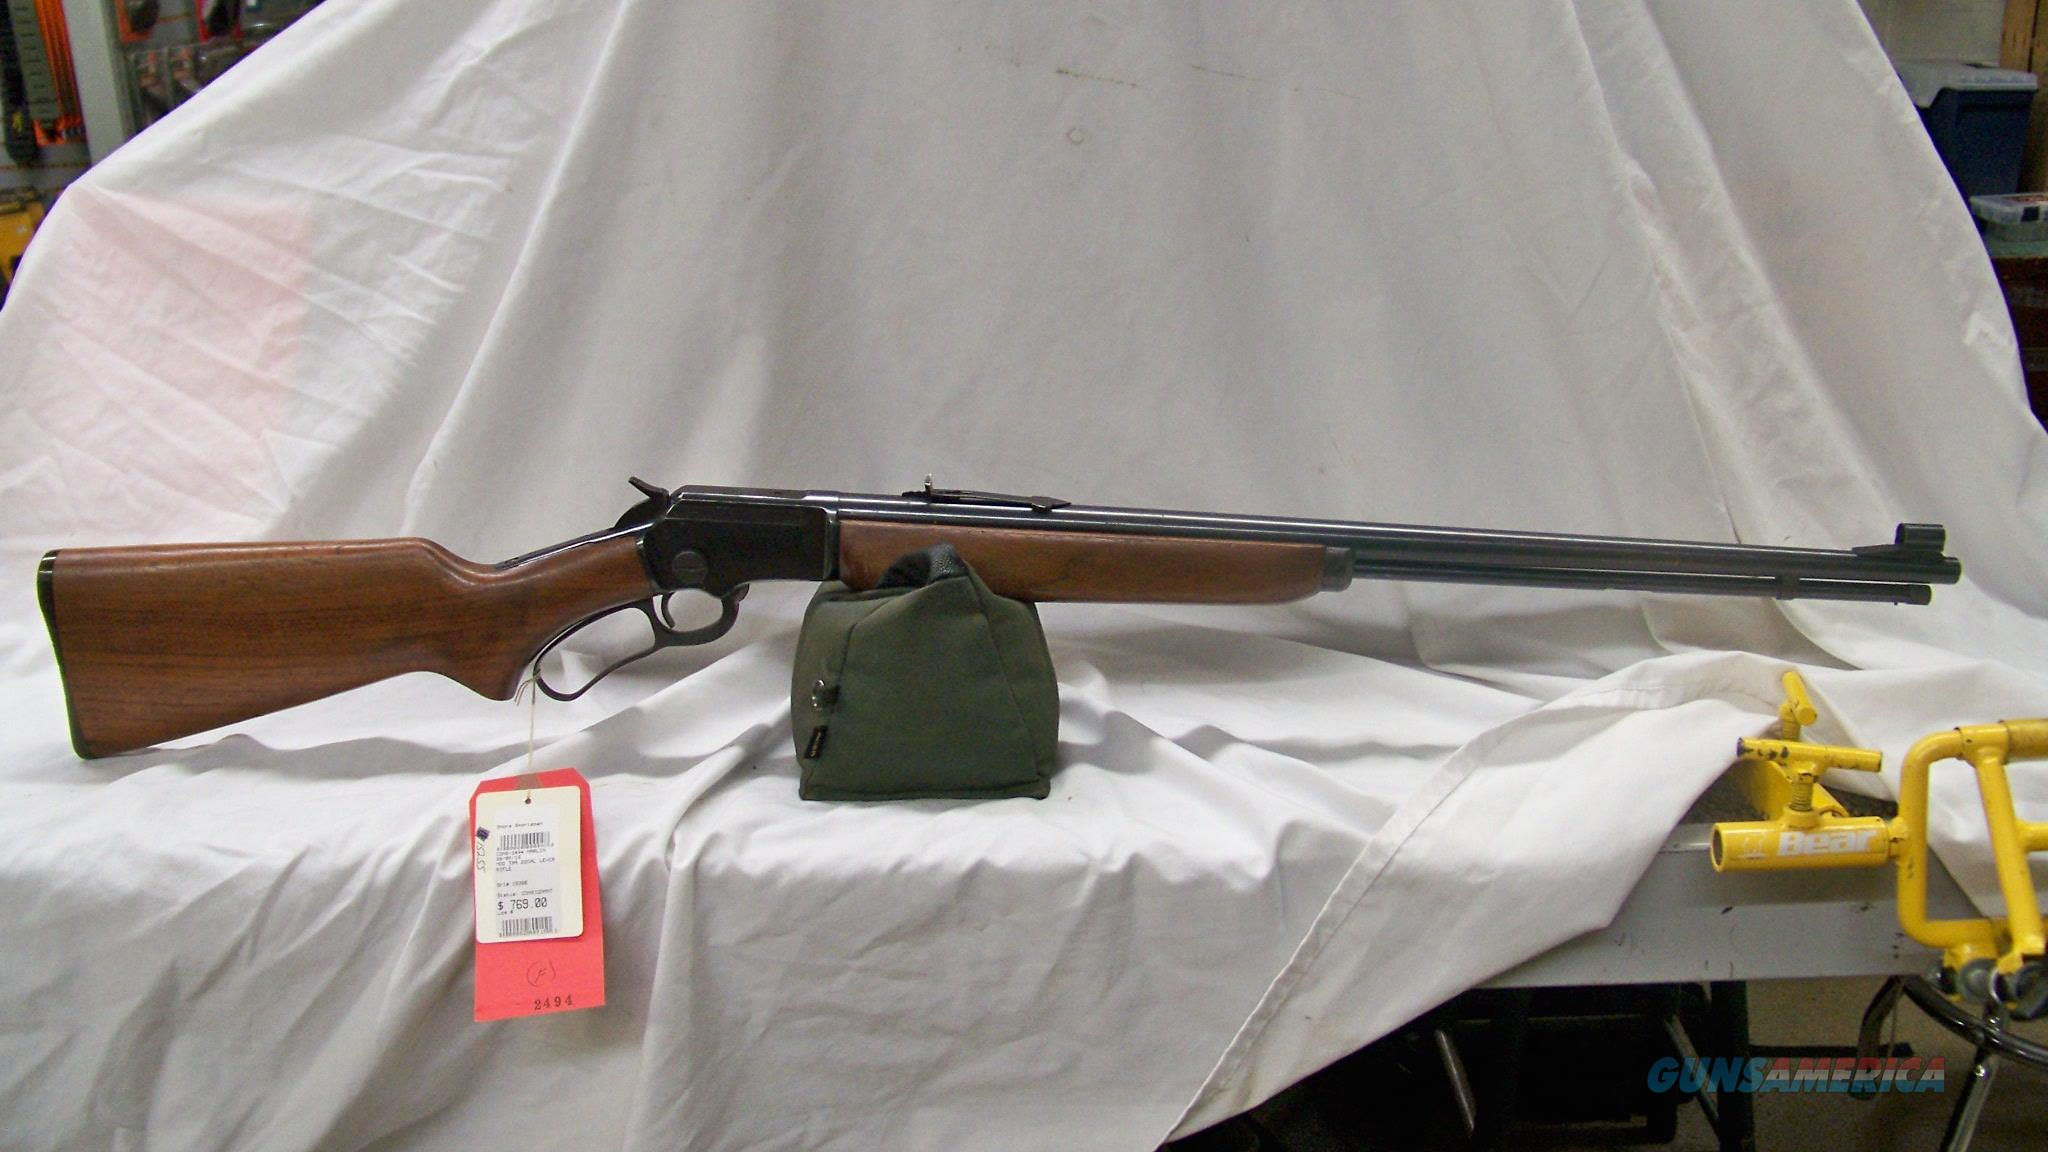 Marlin 39-A .22LR  Guns > Rifles > Marlin Rifles > Modern > Lever Action